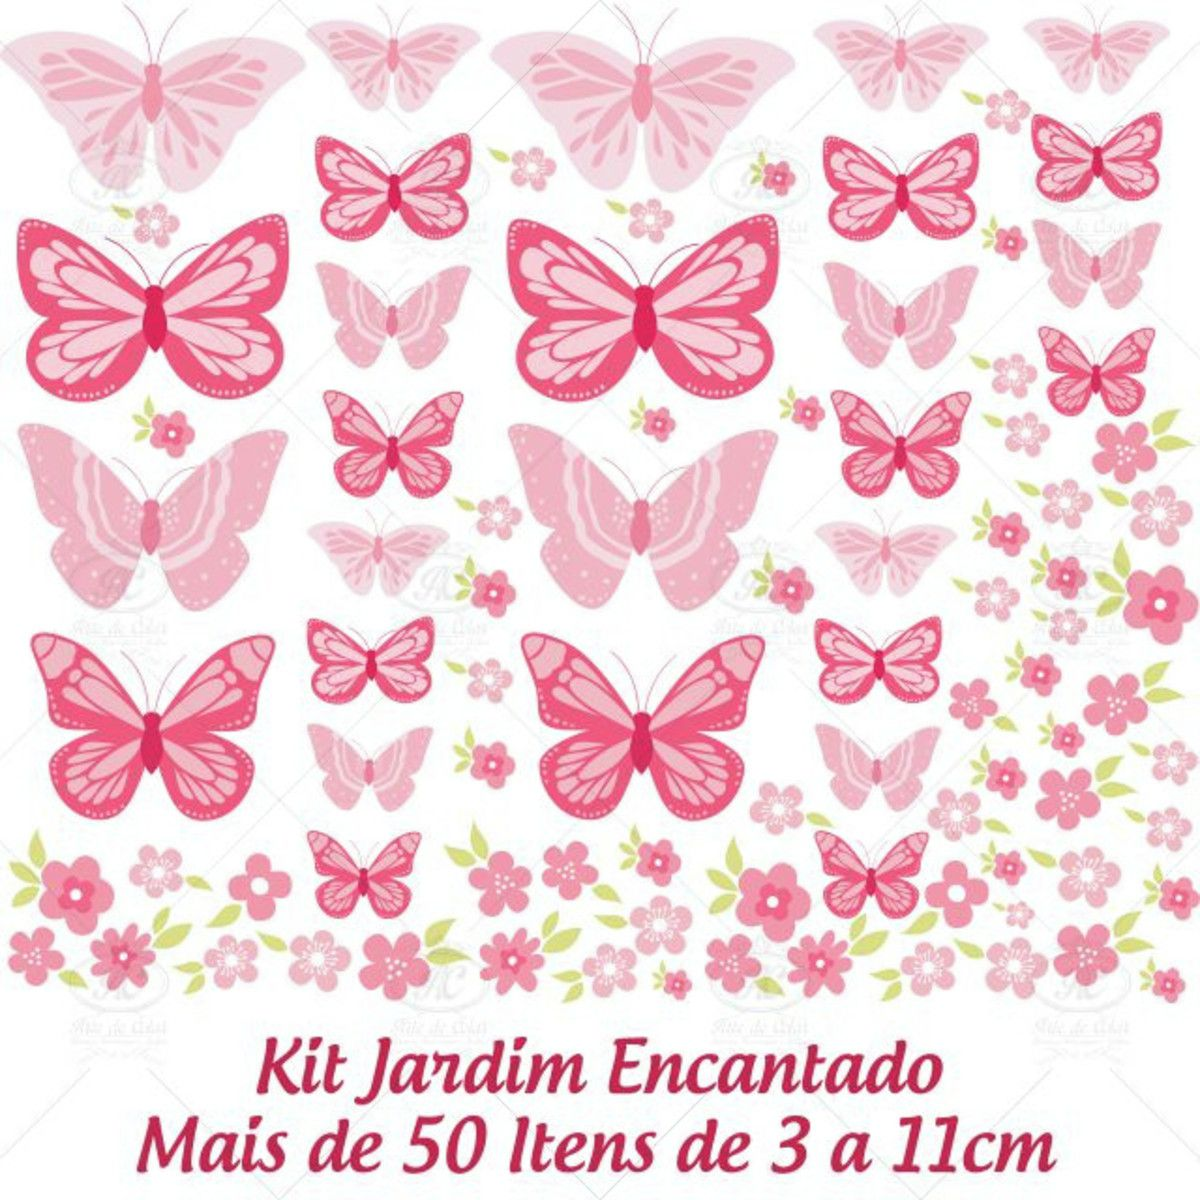 Adesivo Jardim Encantado Flores e Borboletas-JD03